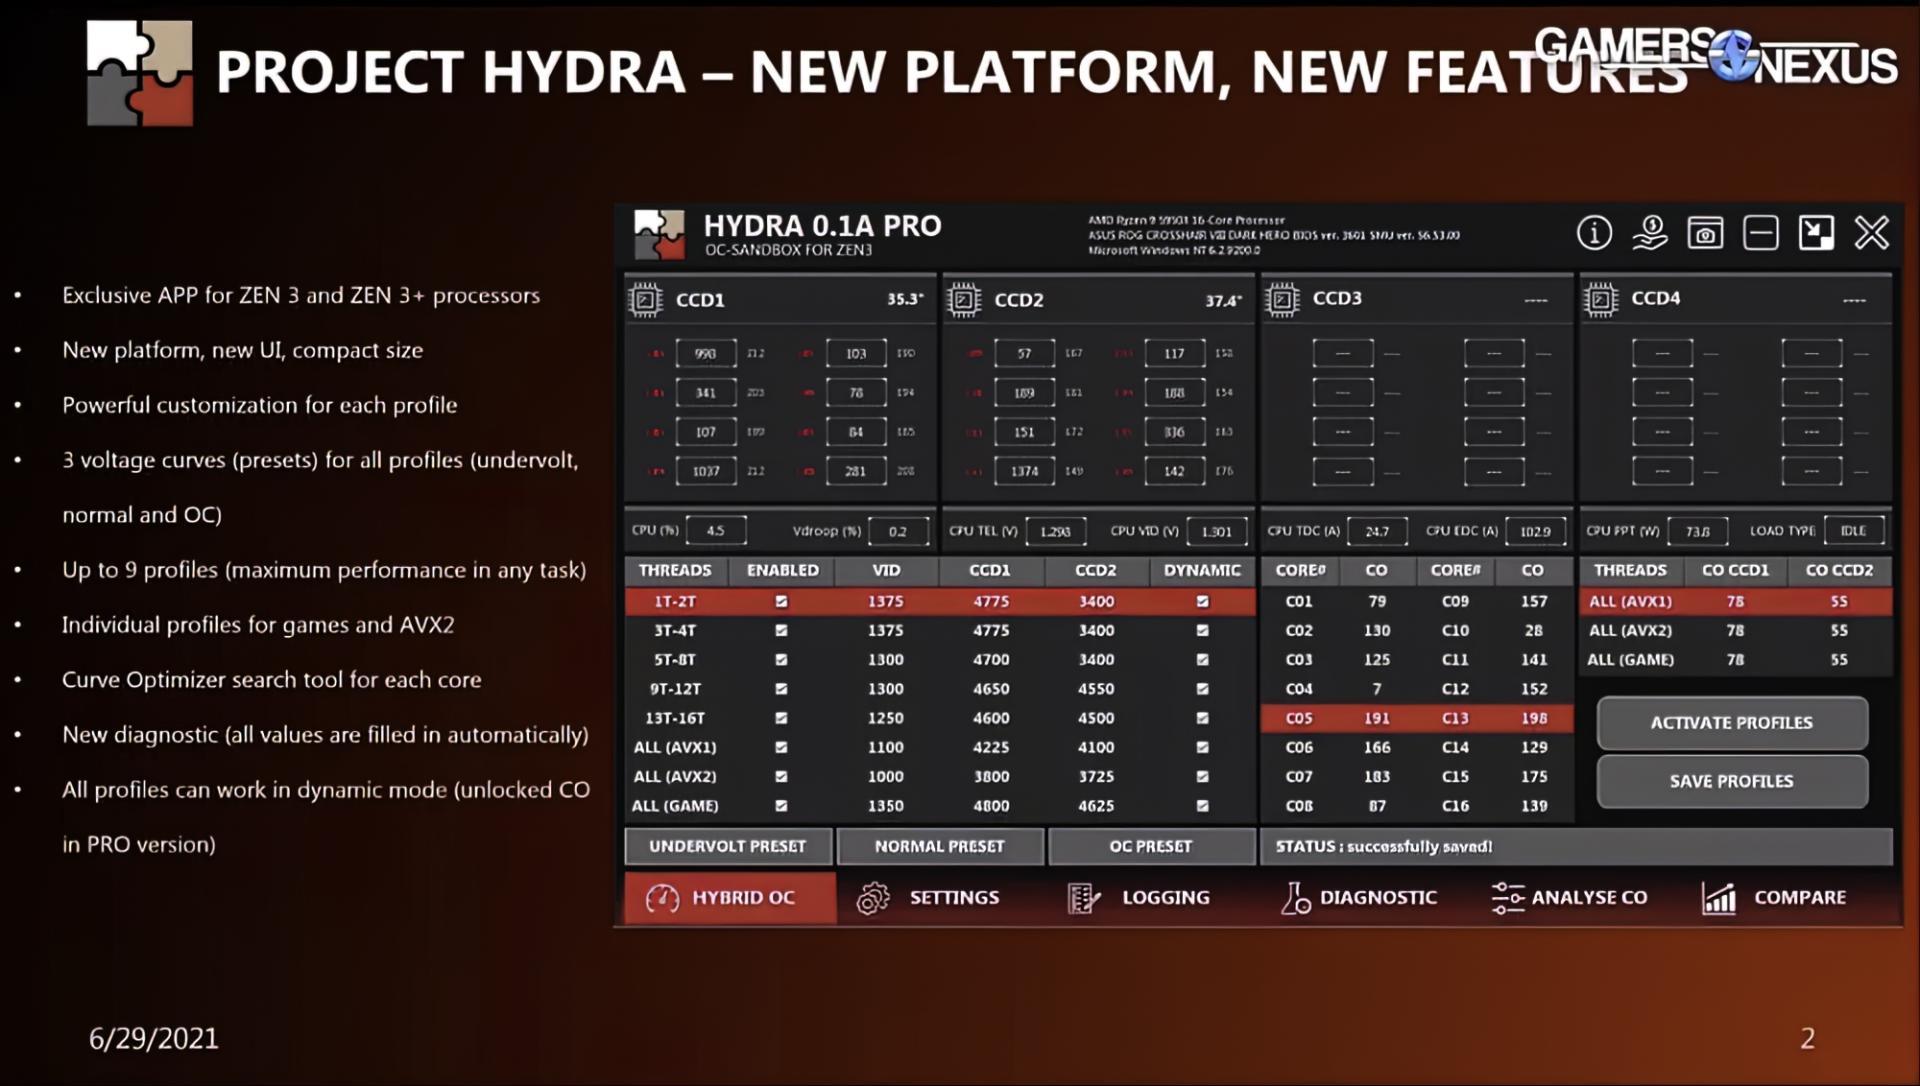 Автоматический разгон процессоров AMD станет эффективнее и проще с Project Hydra